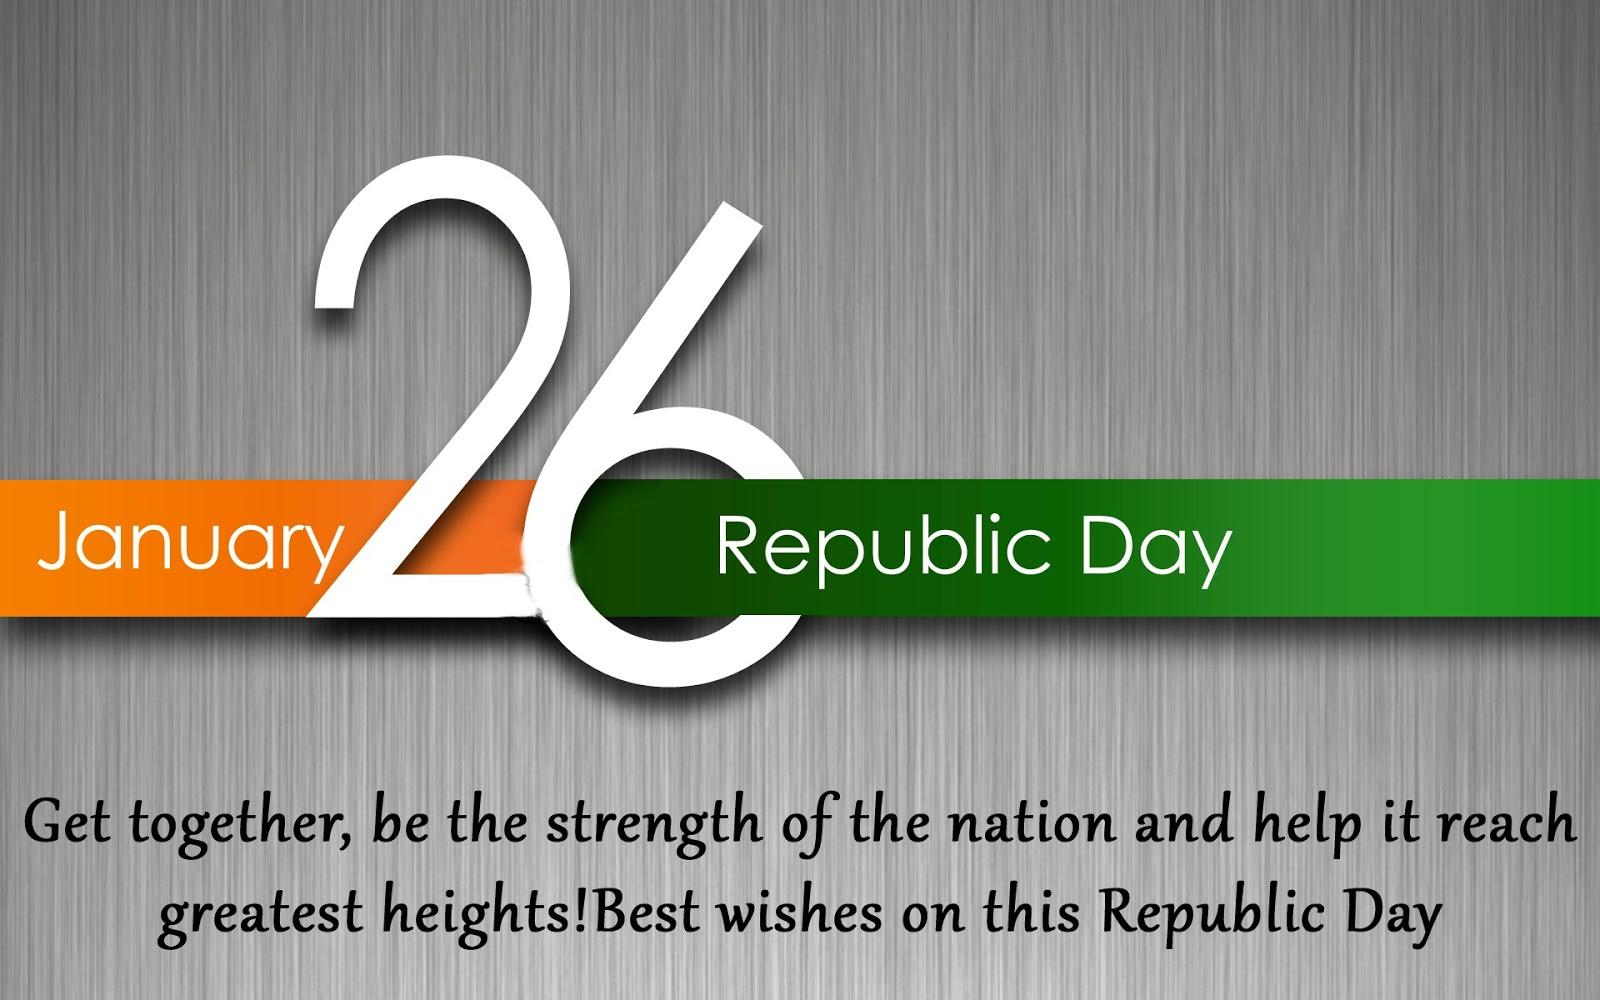 Republic Day 2018 Slogans